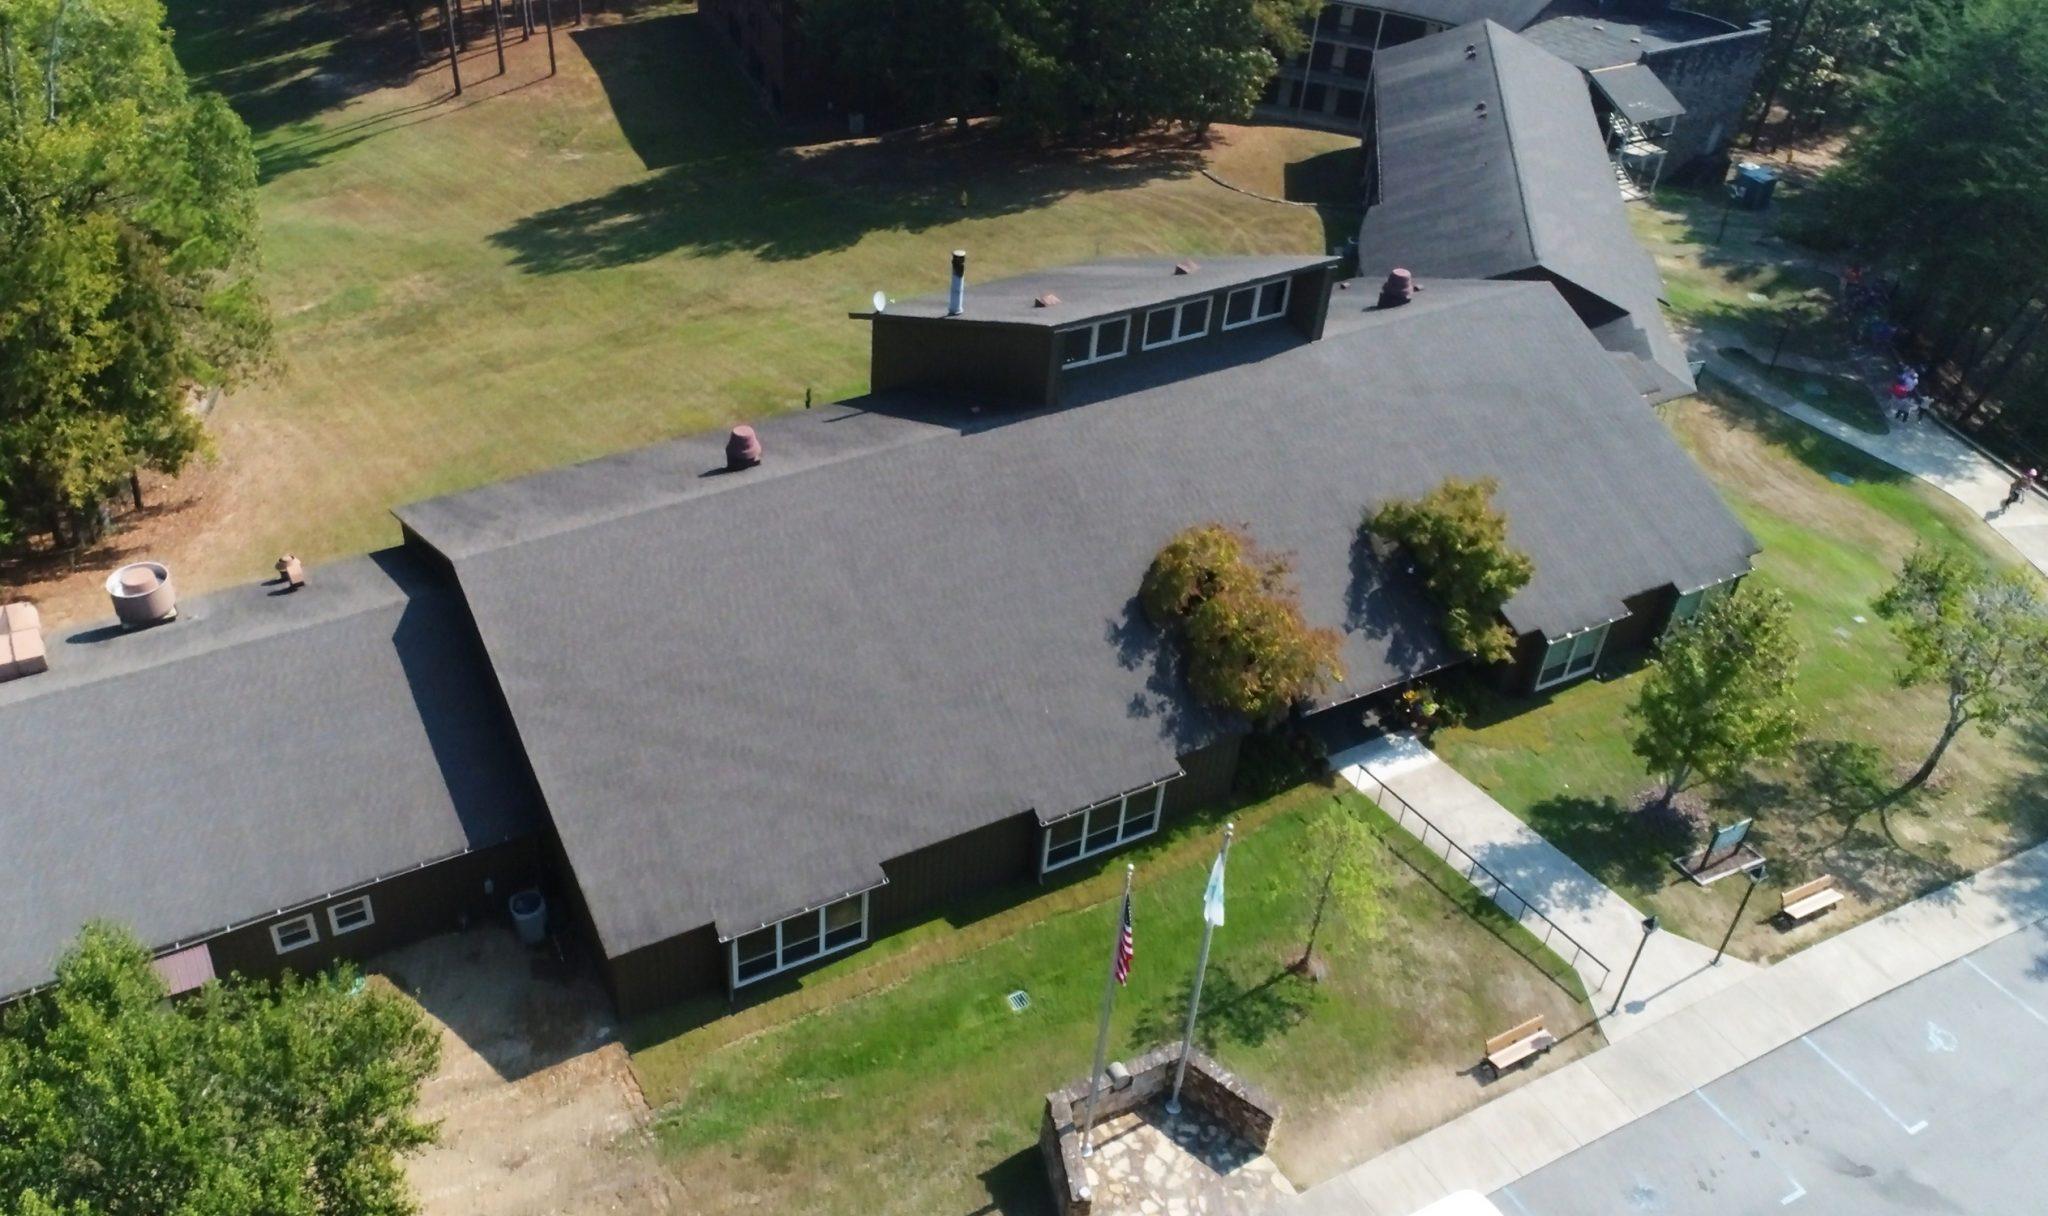 4-H Capital Campaign, drone footage of Alabama 4-H Center